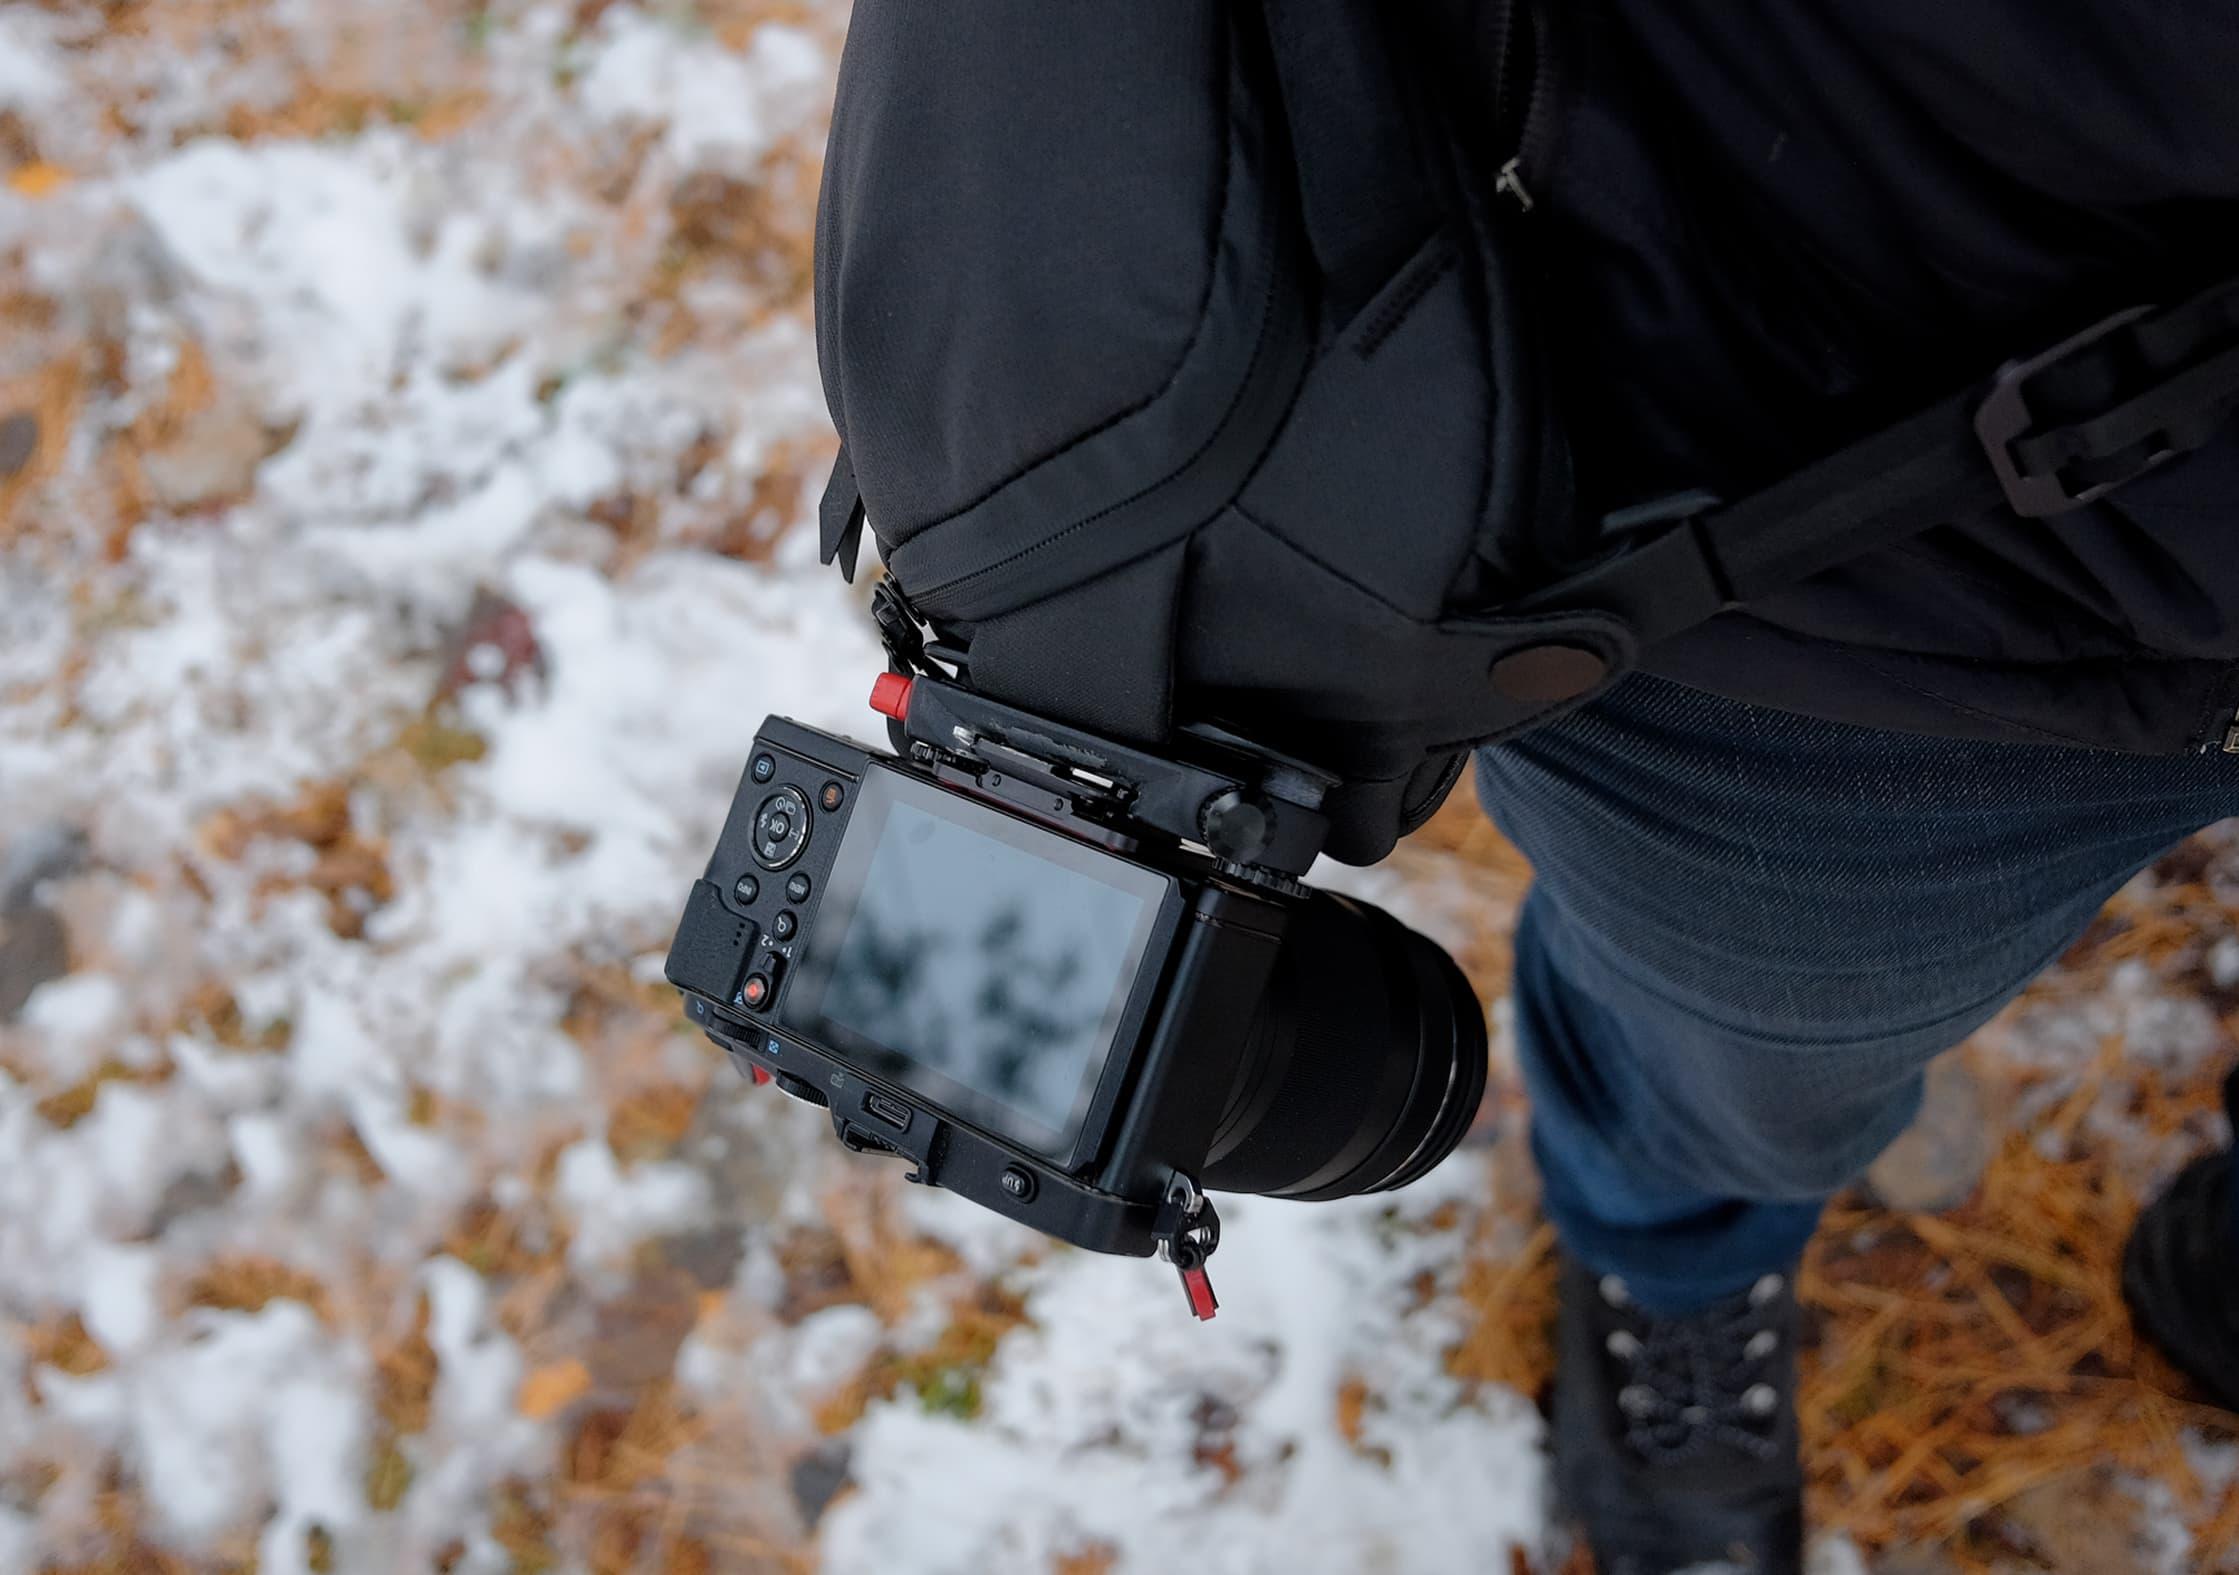 Peak Design Everyday Sling 5L with Capture Clip